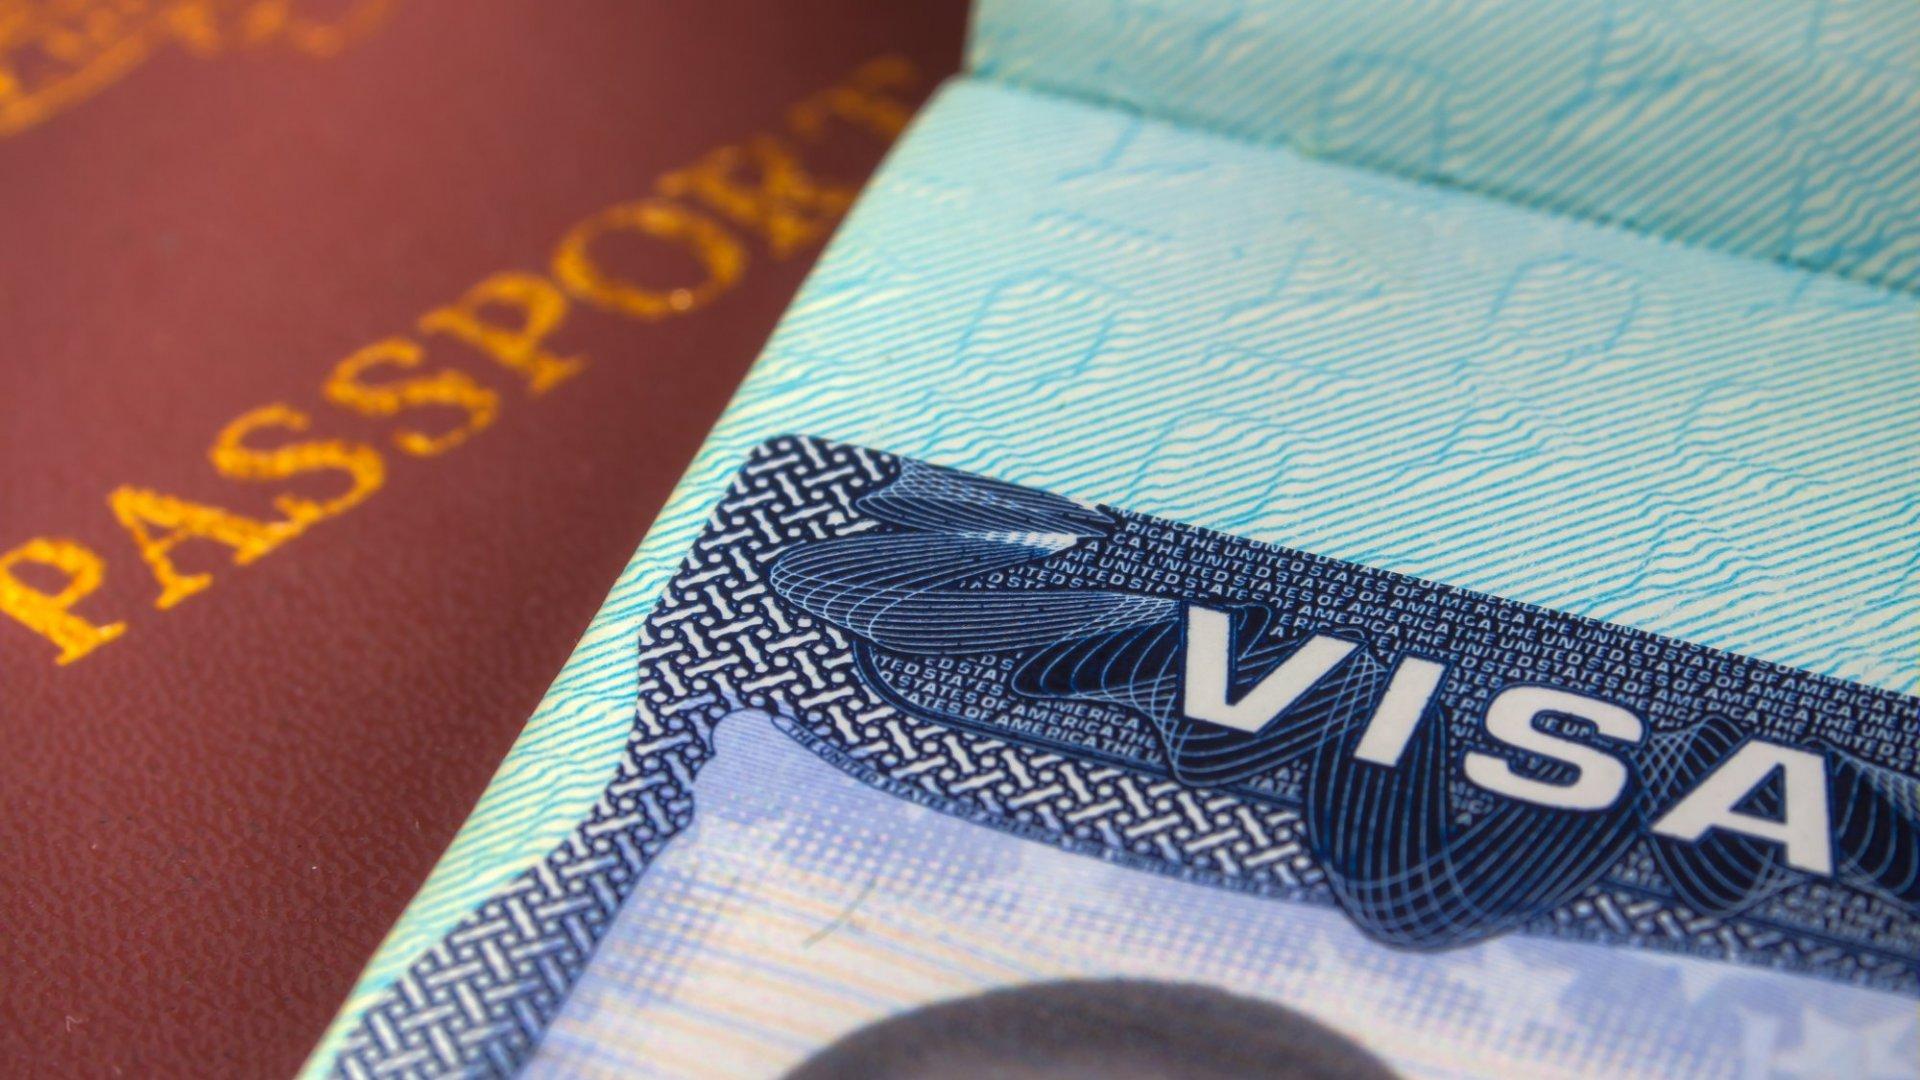 Inc. Uncensored: Whatever Happened to the U.S. Startup Visa?